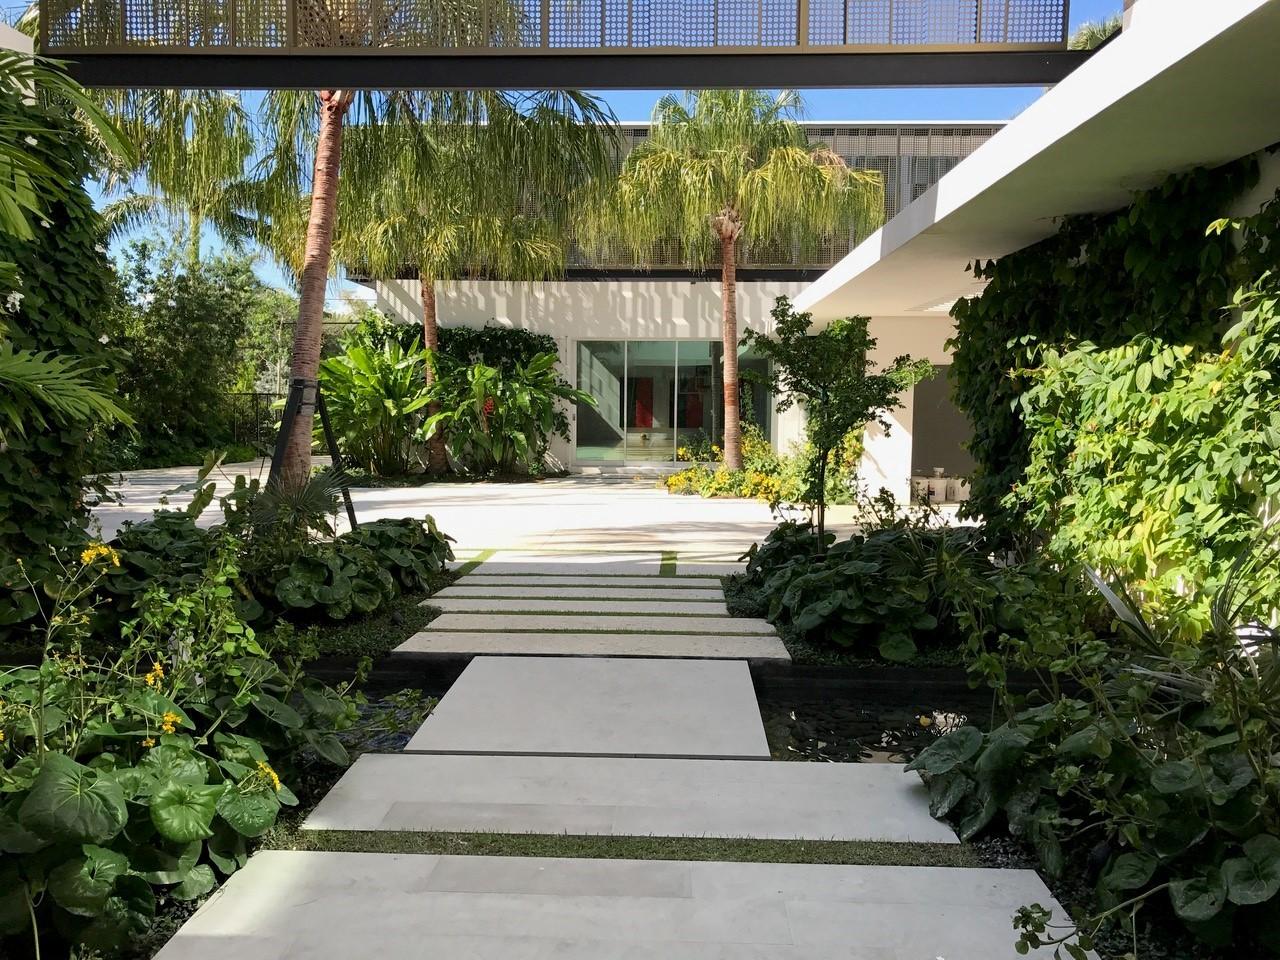 Landscape Architecture For SAOTA Homes - SAOTA ...